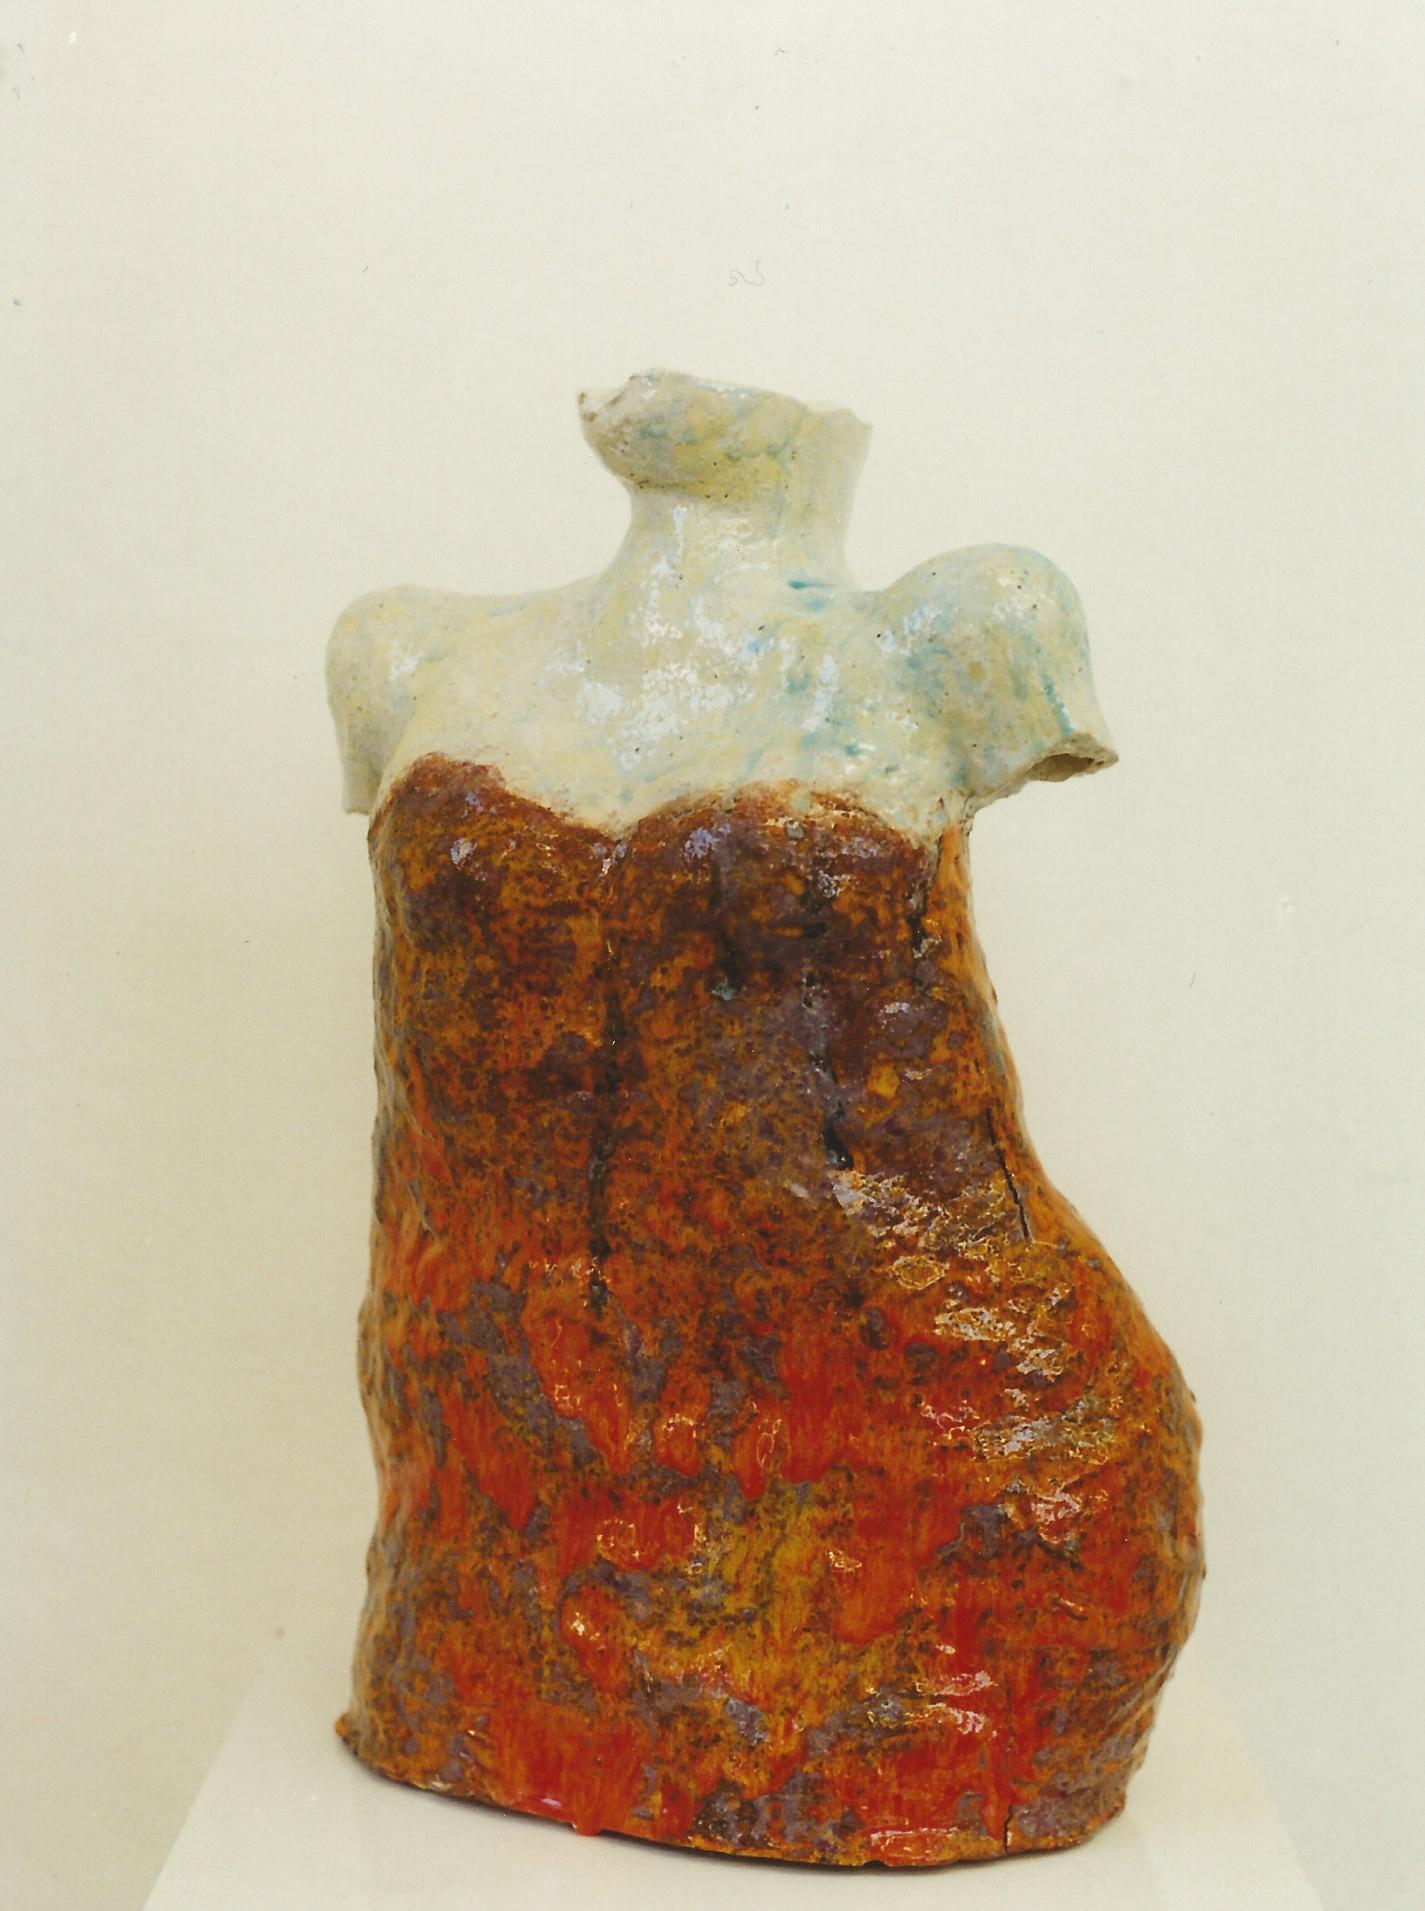 Larney, Keramik glasiert, 1998, (50 x 33 x 21,5 cm)